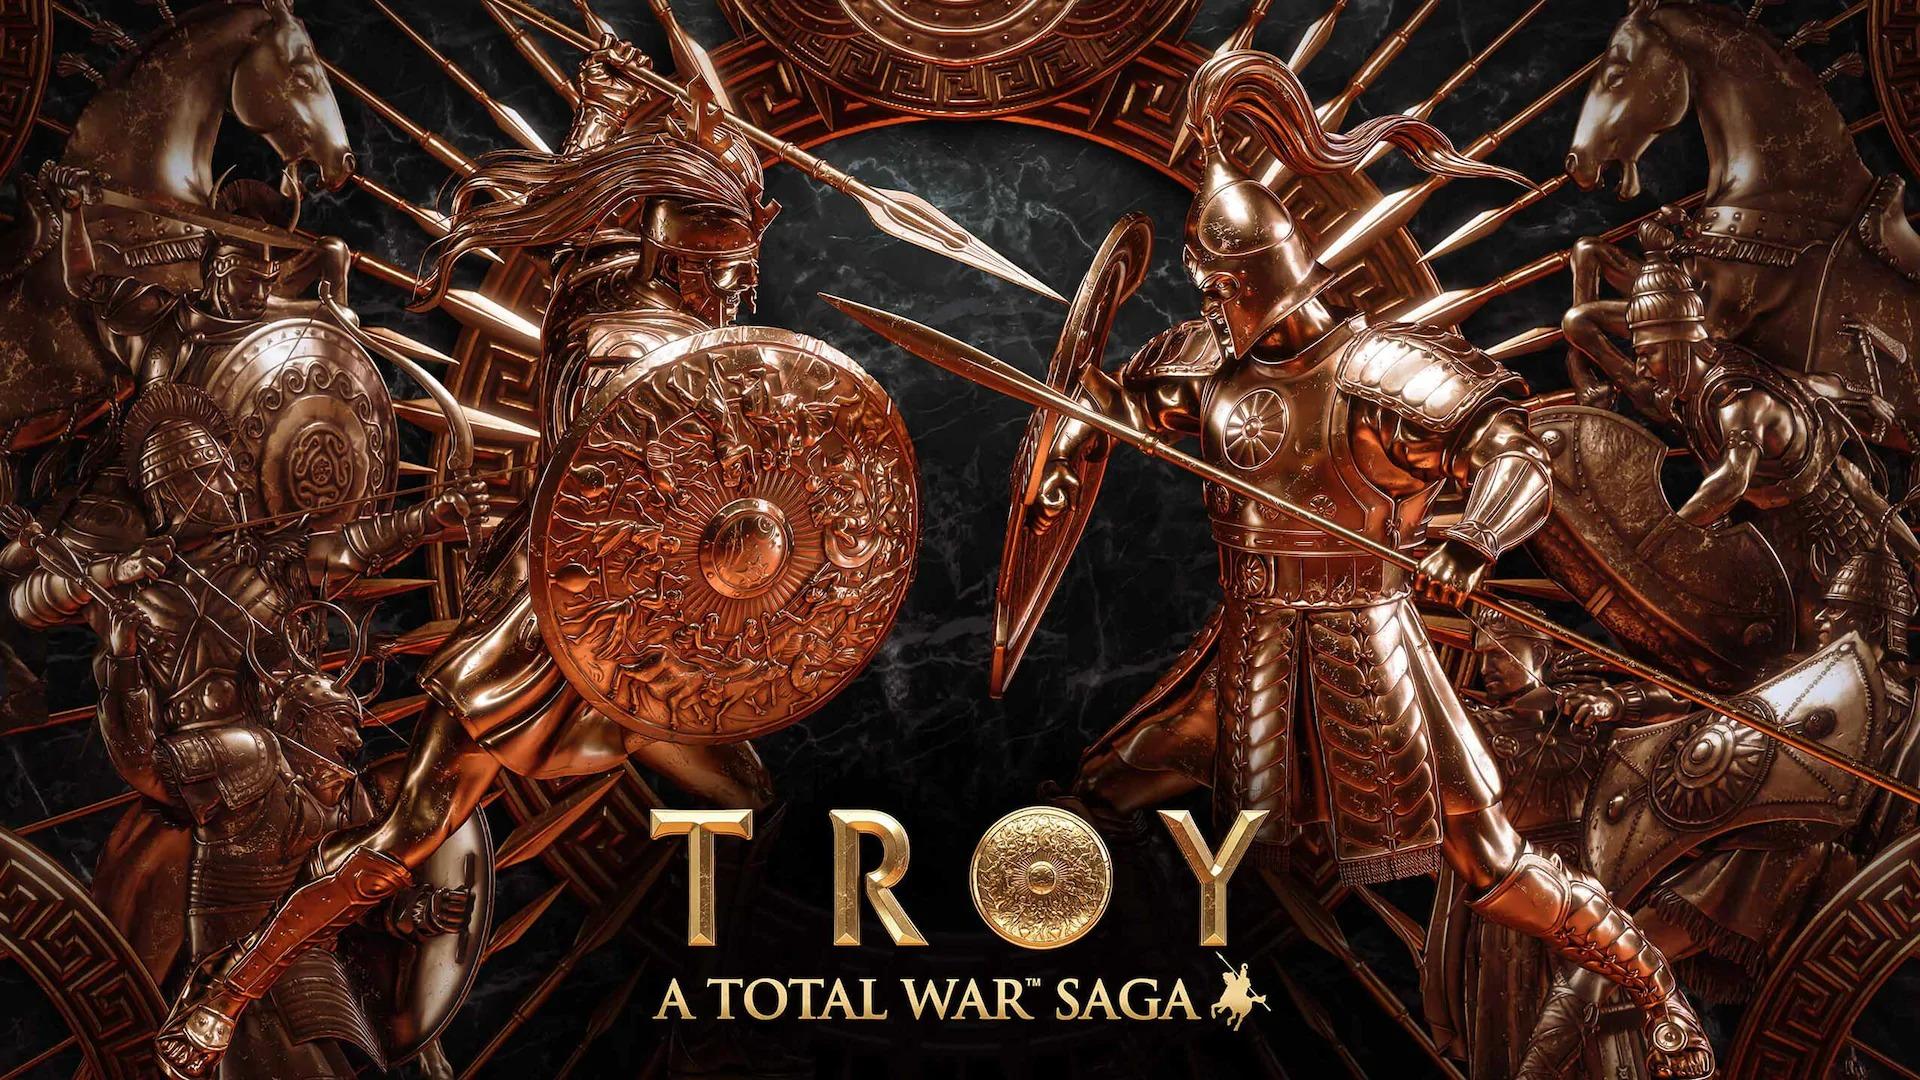 EpicGamesでリアルタイムストラテジーゲーム「A Total War Saga: TROY」(定価5488円)が発売と同時に24時間限定で無料配信中。~8/14 22時。